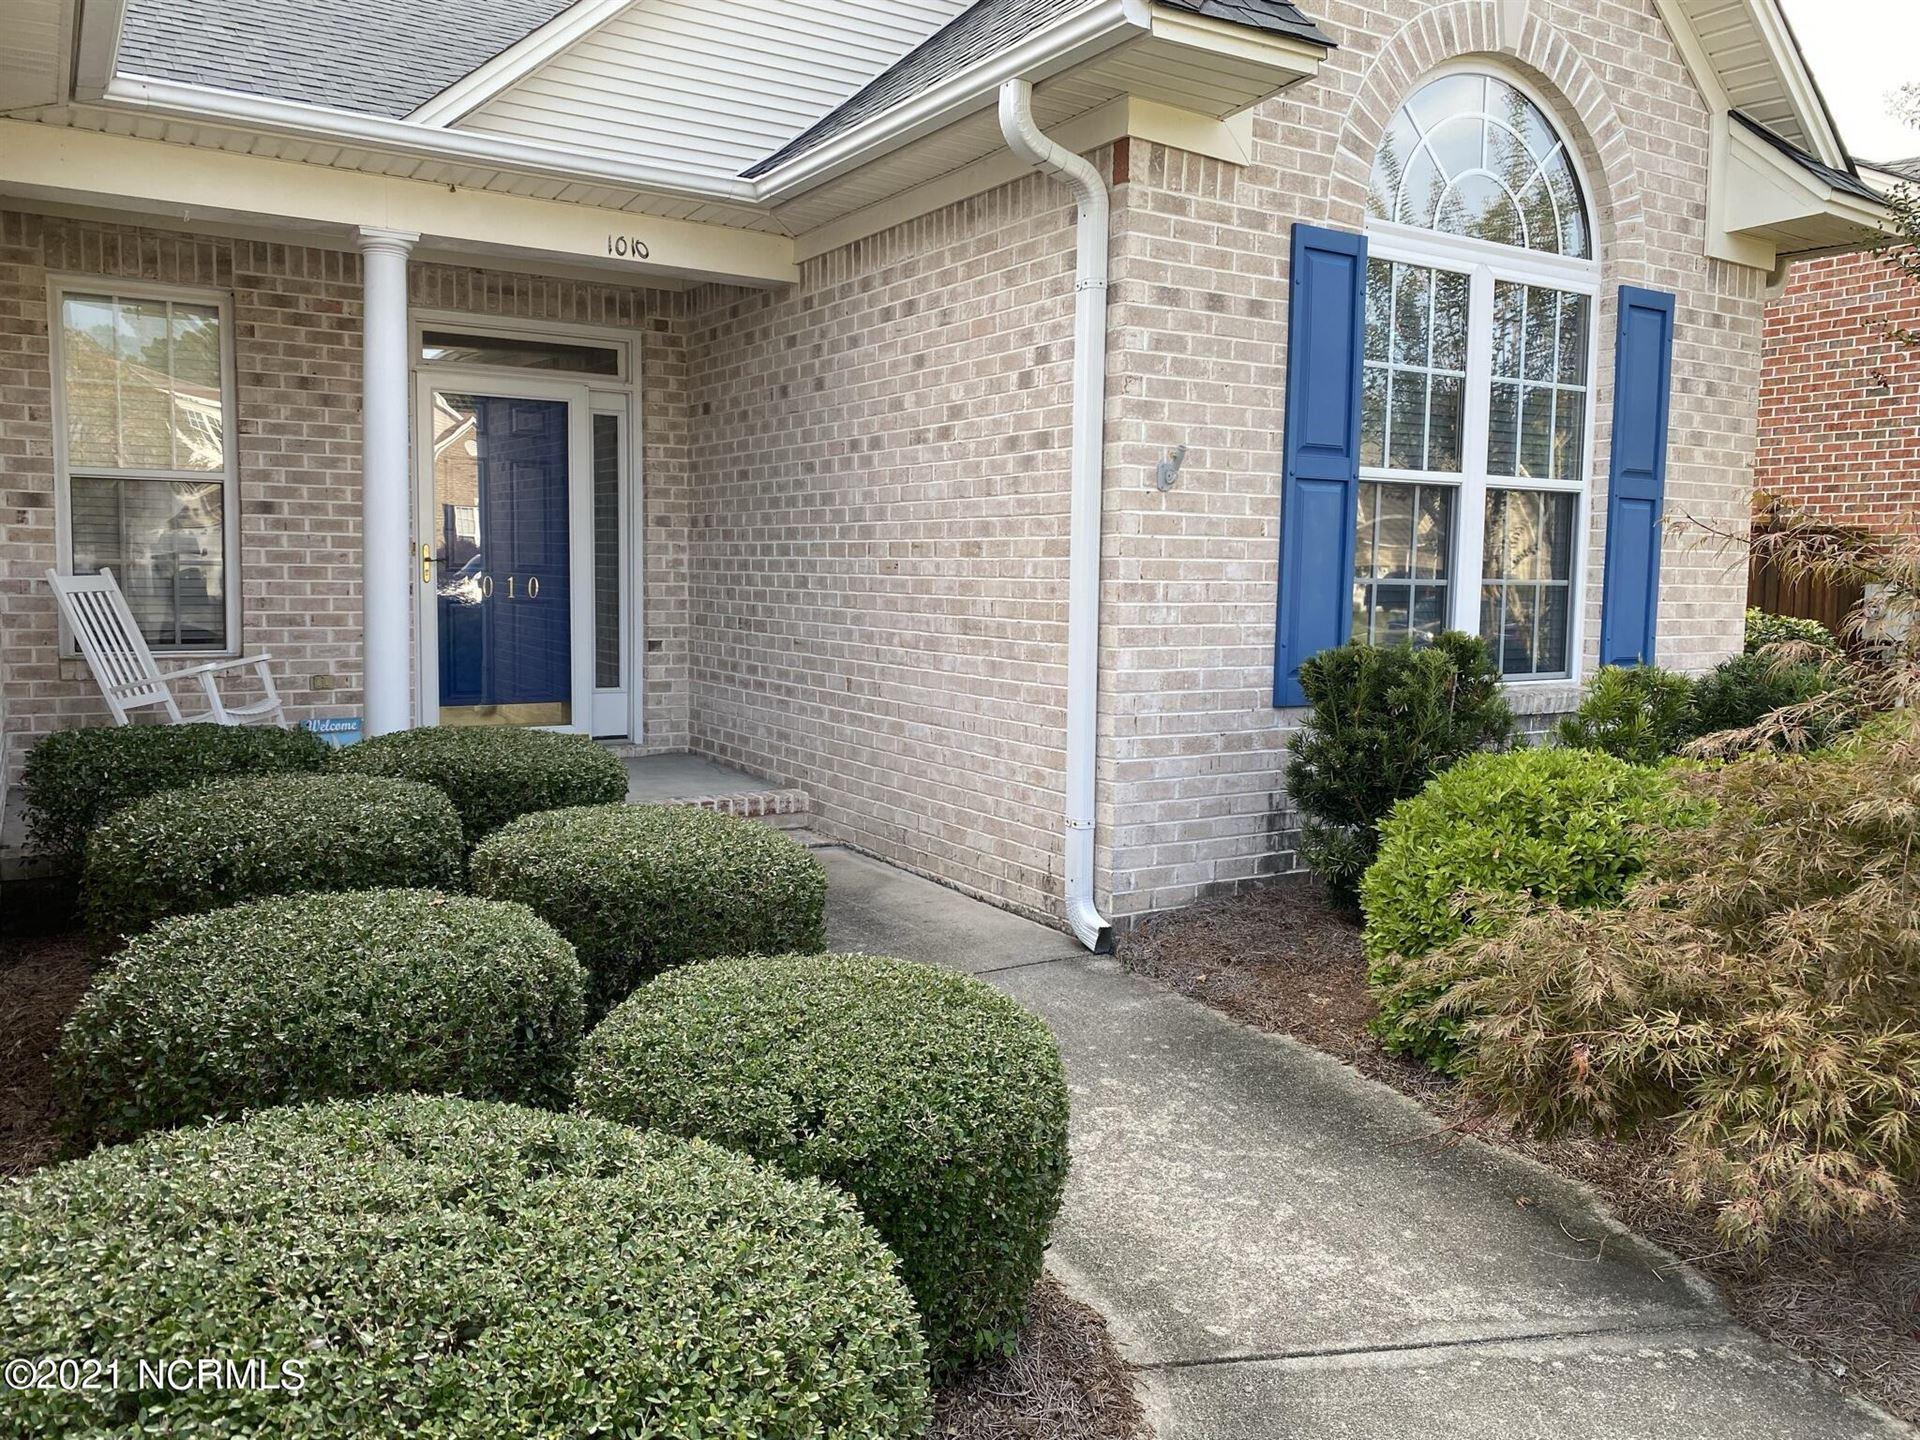 Photo of 1010 Cordgrass Lane, Leland, NC 28451 (MLS # 100292727)